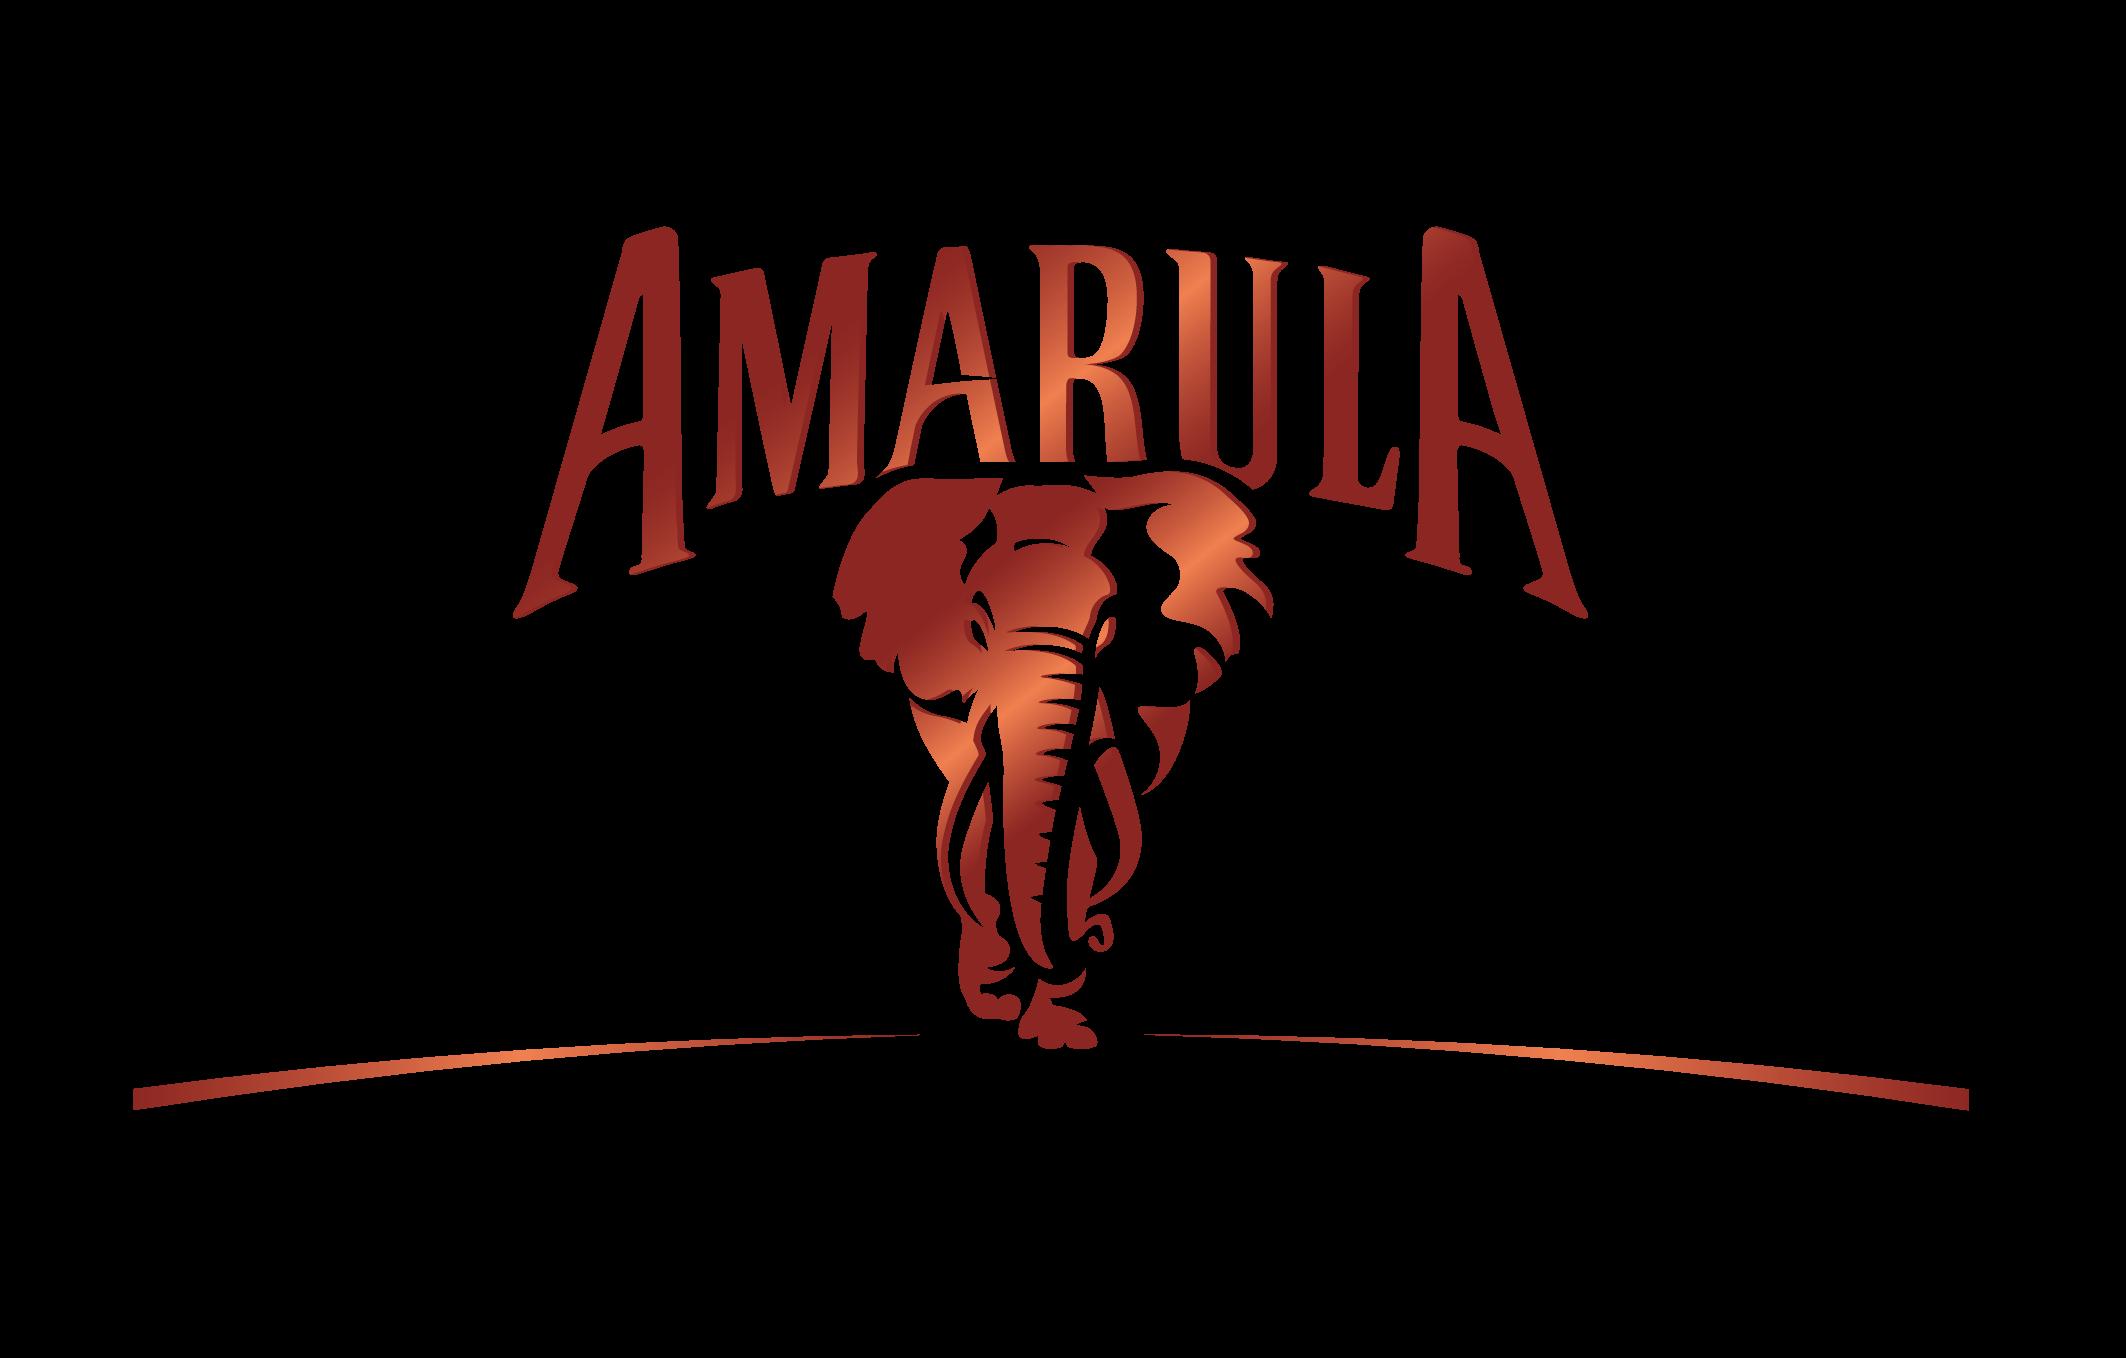 Amarula Canada